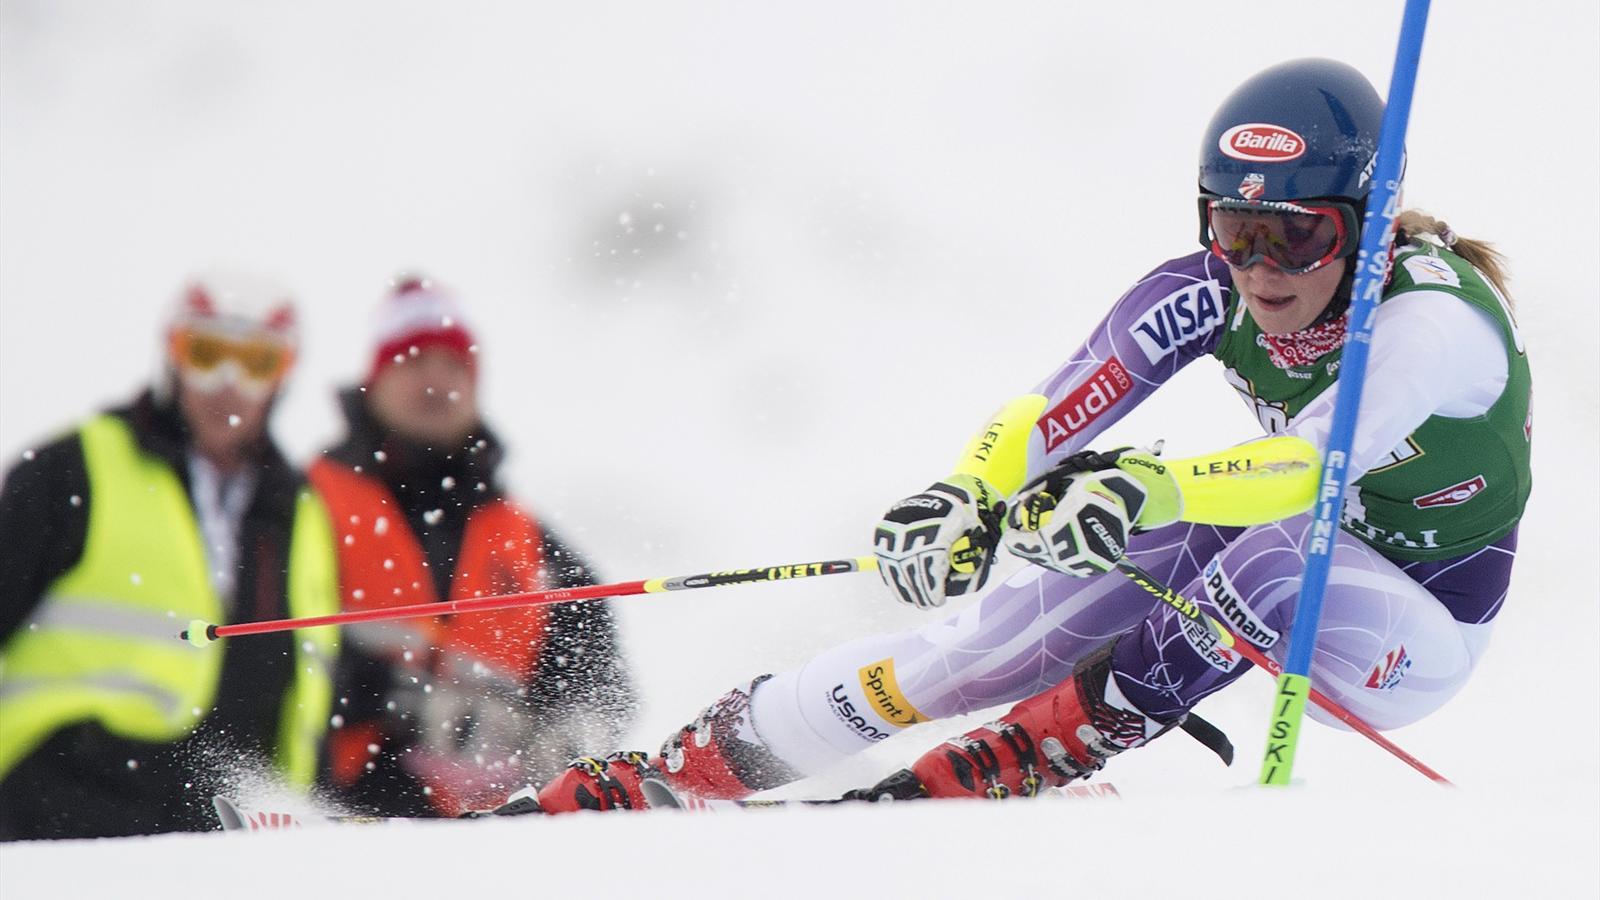 Coupe du monde slalom flachau mikaela shiffrin est - Coupe du monde ski alpin 2015 calendrier ...